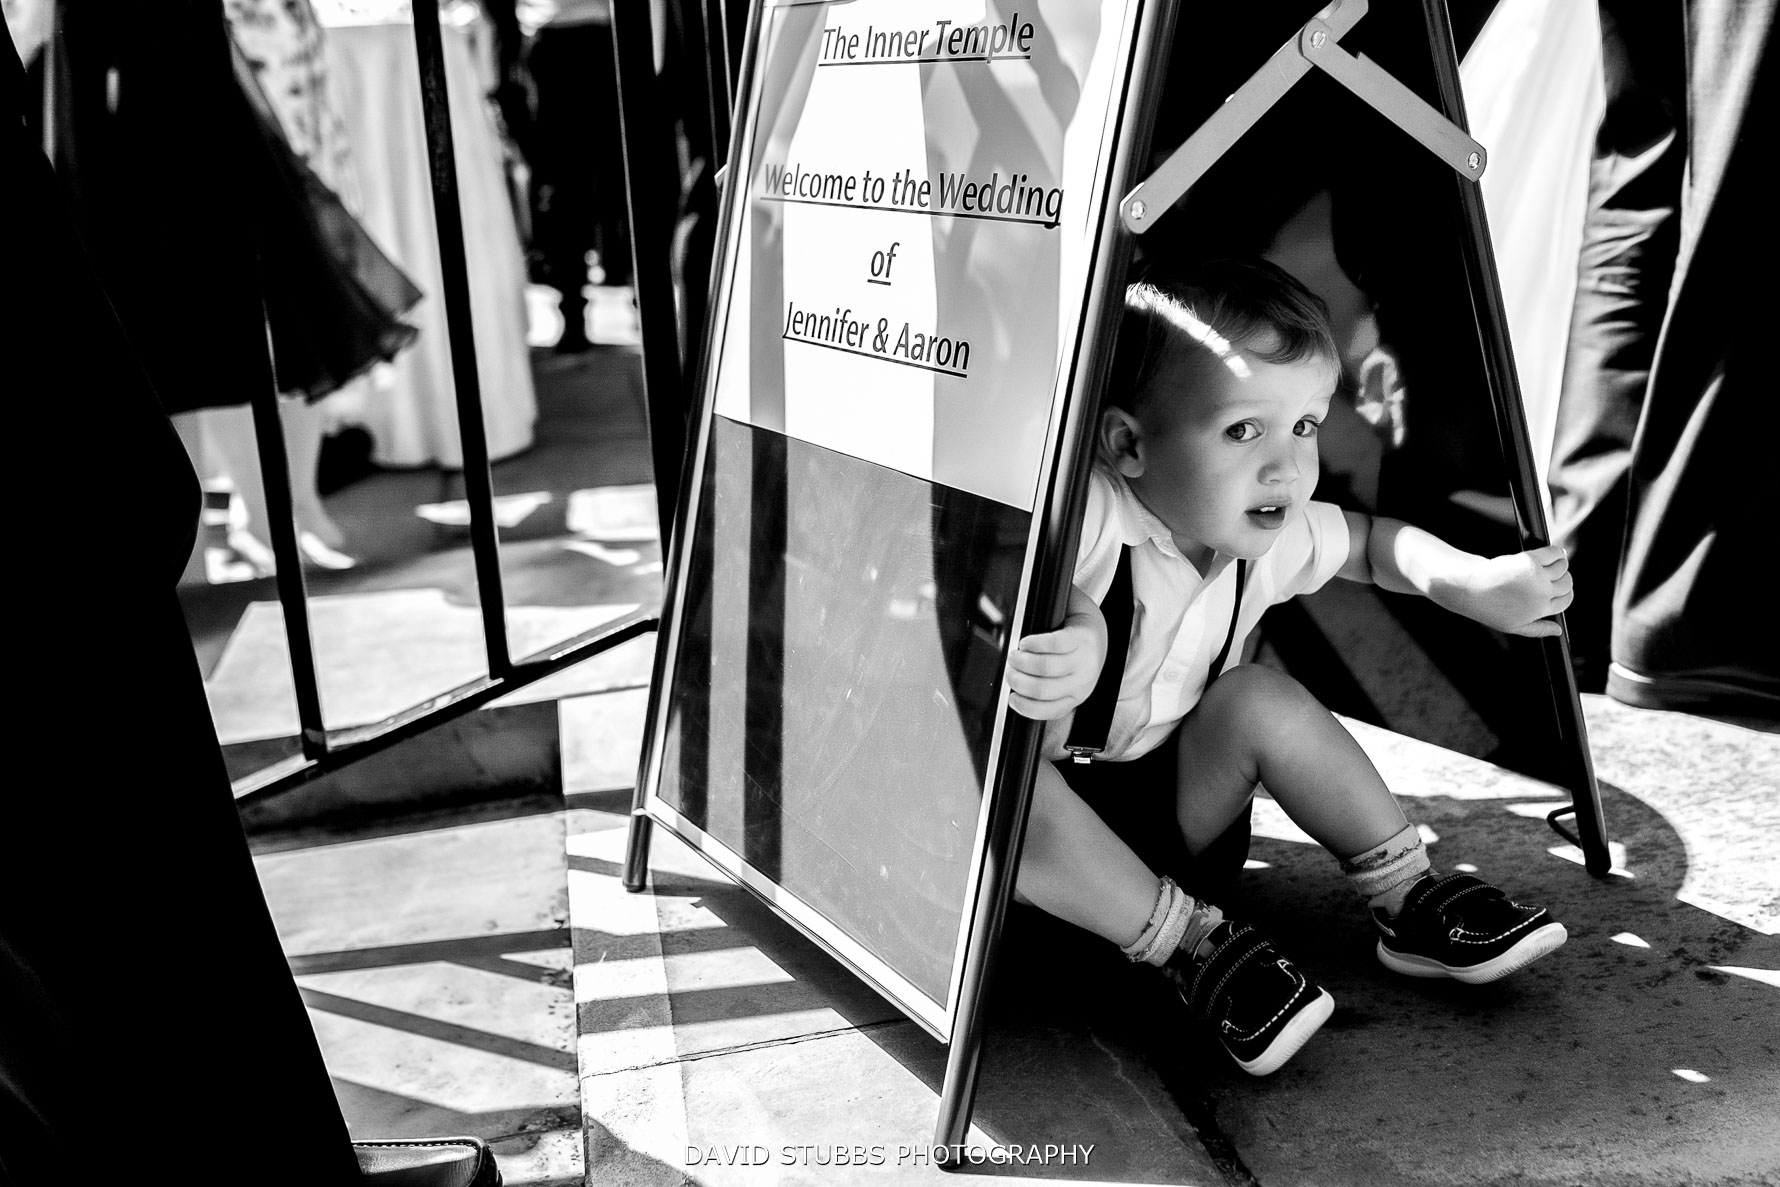 kid under sign at inner temple wedding